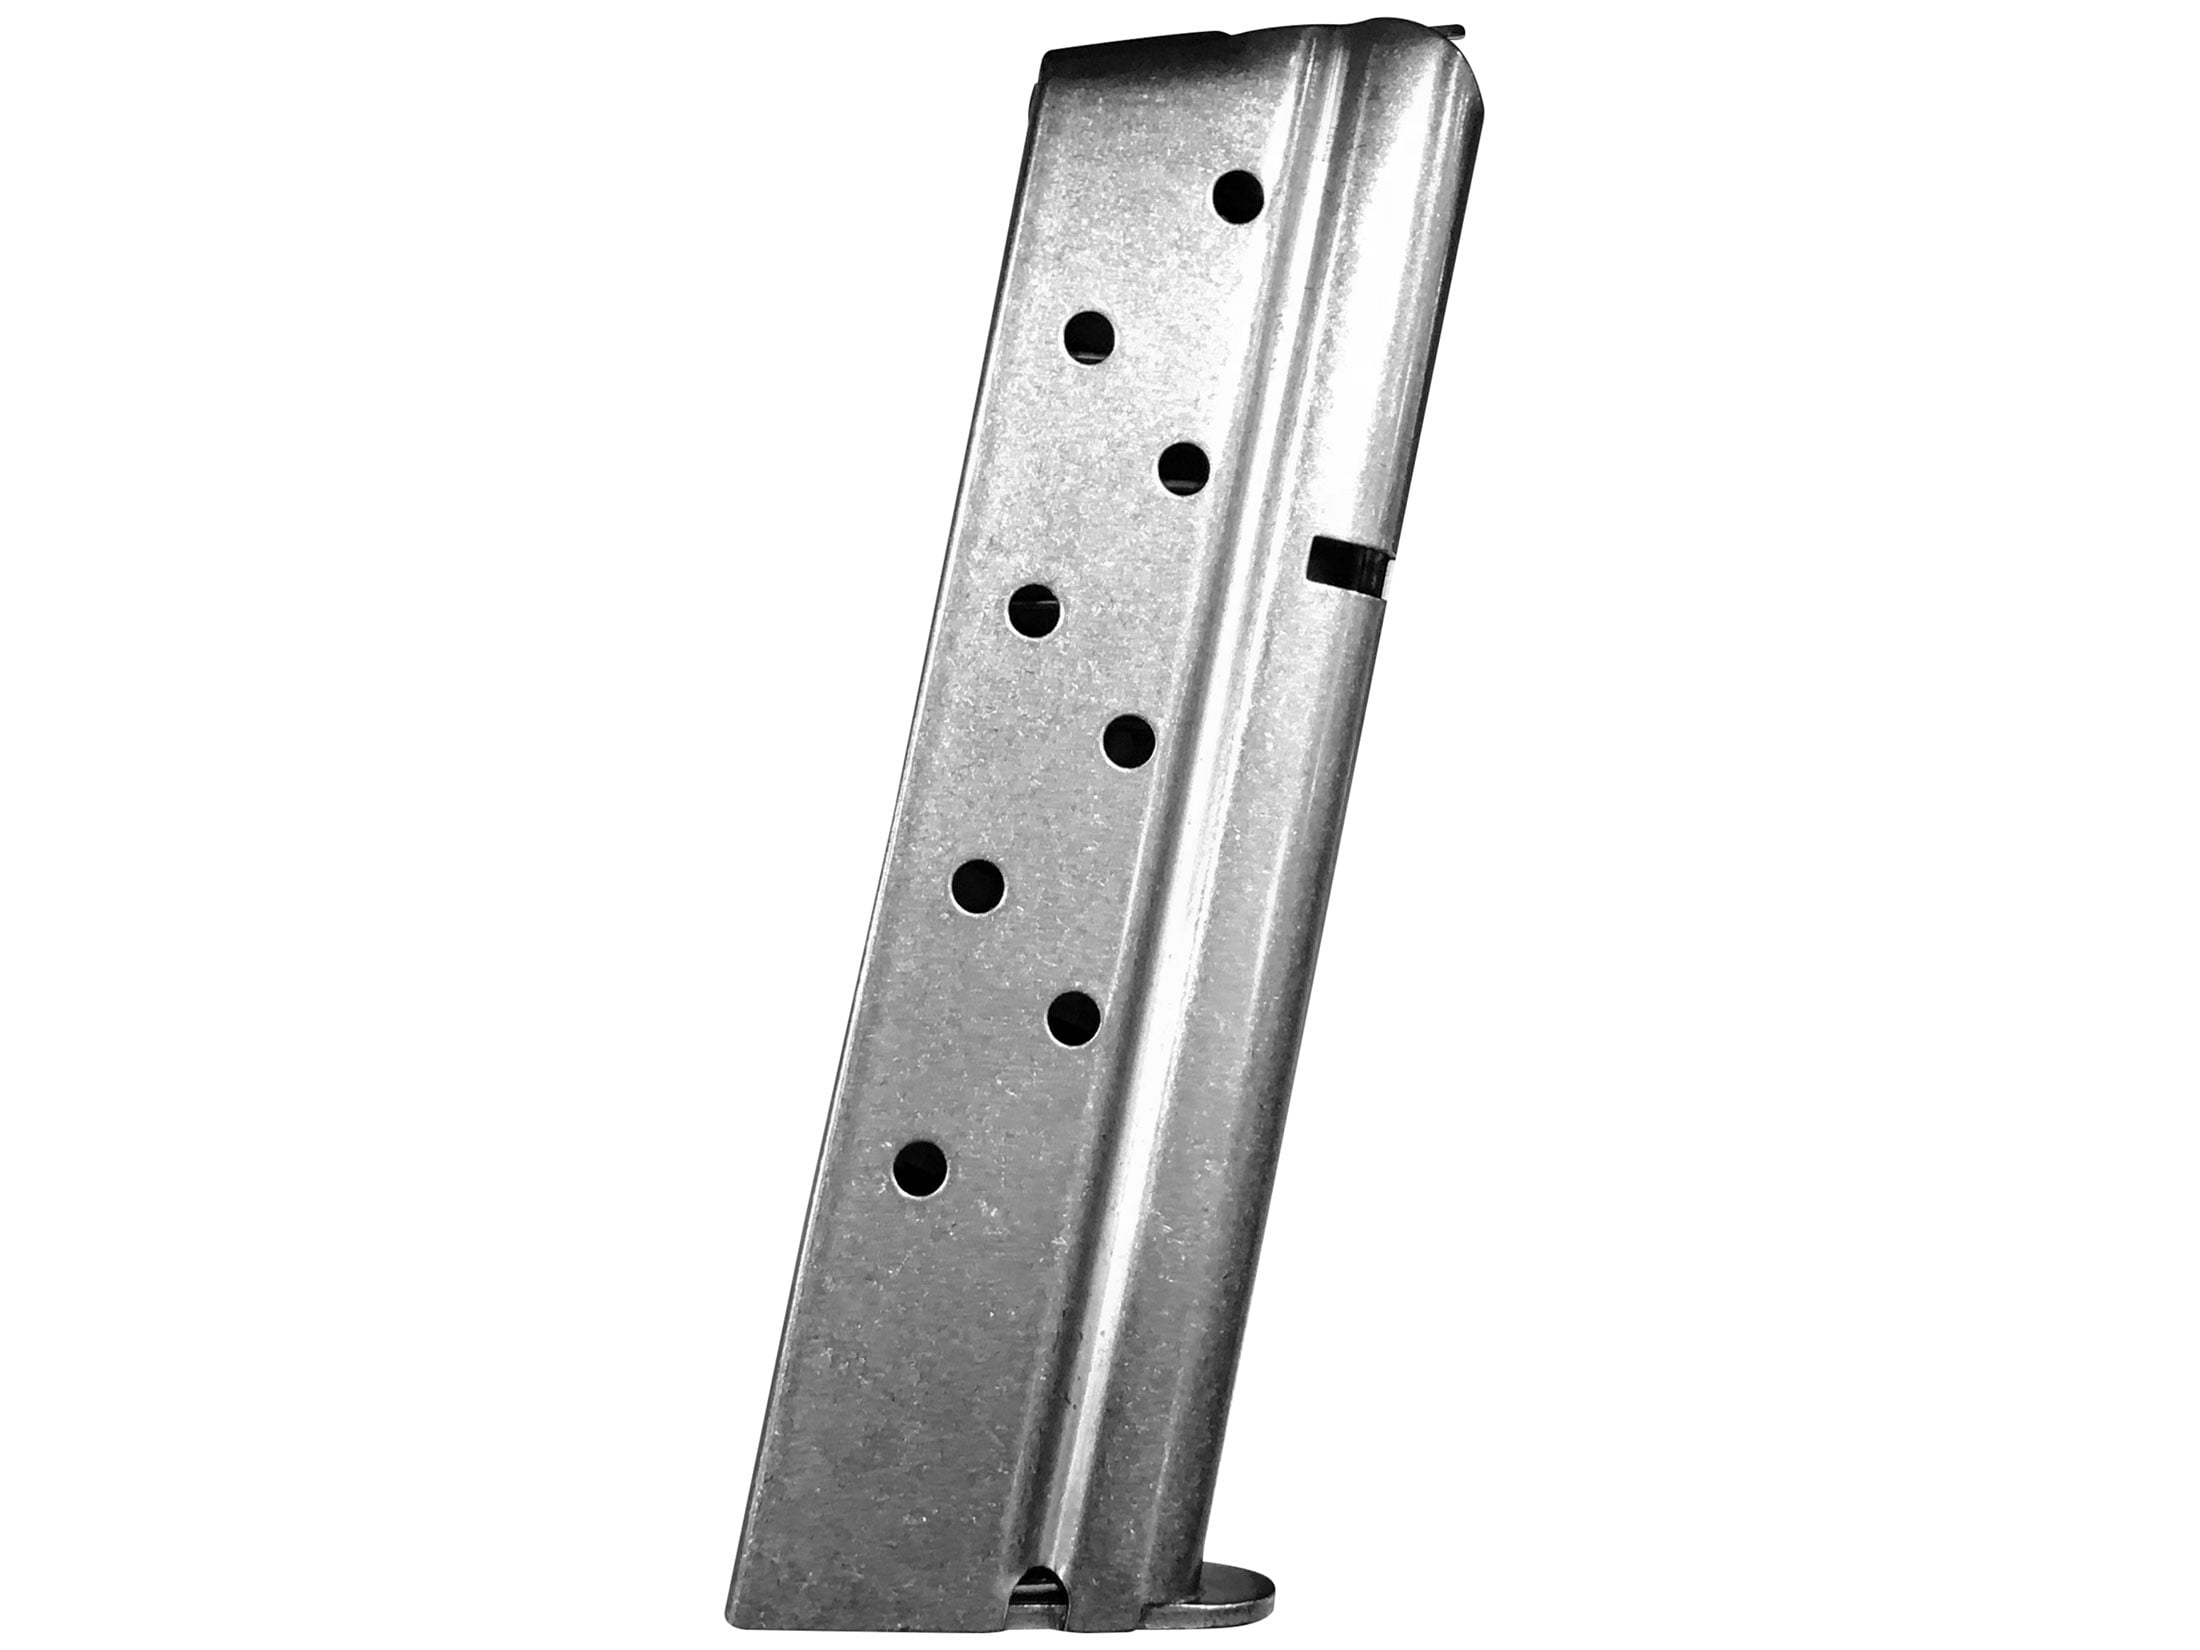 10Pcs Billiard Cue Tips Brass Screw-on Replacement With Pool Stick Ferrules Jian